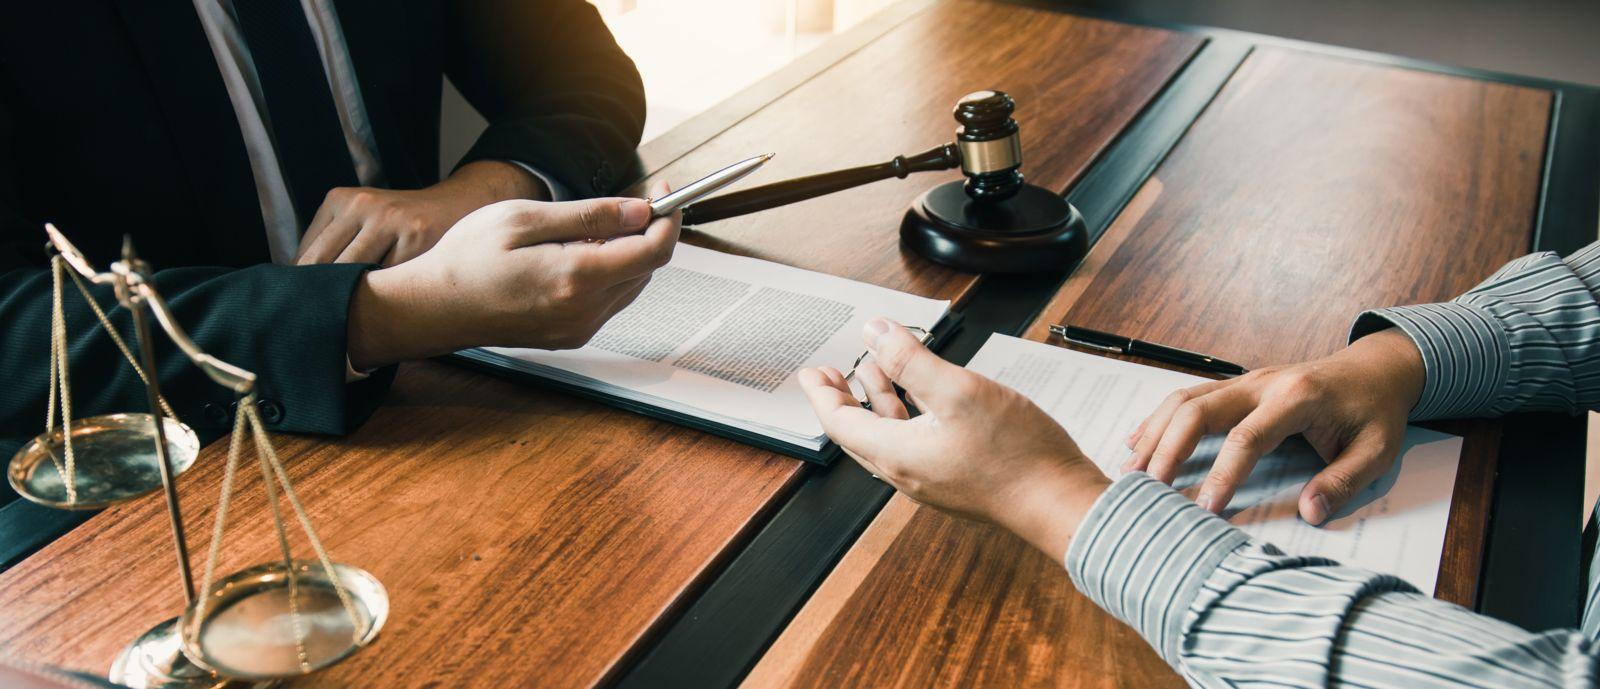 kansas city employment law attorneys